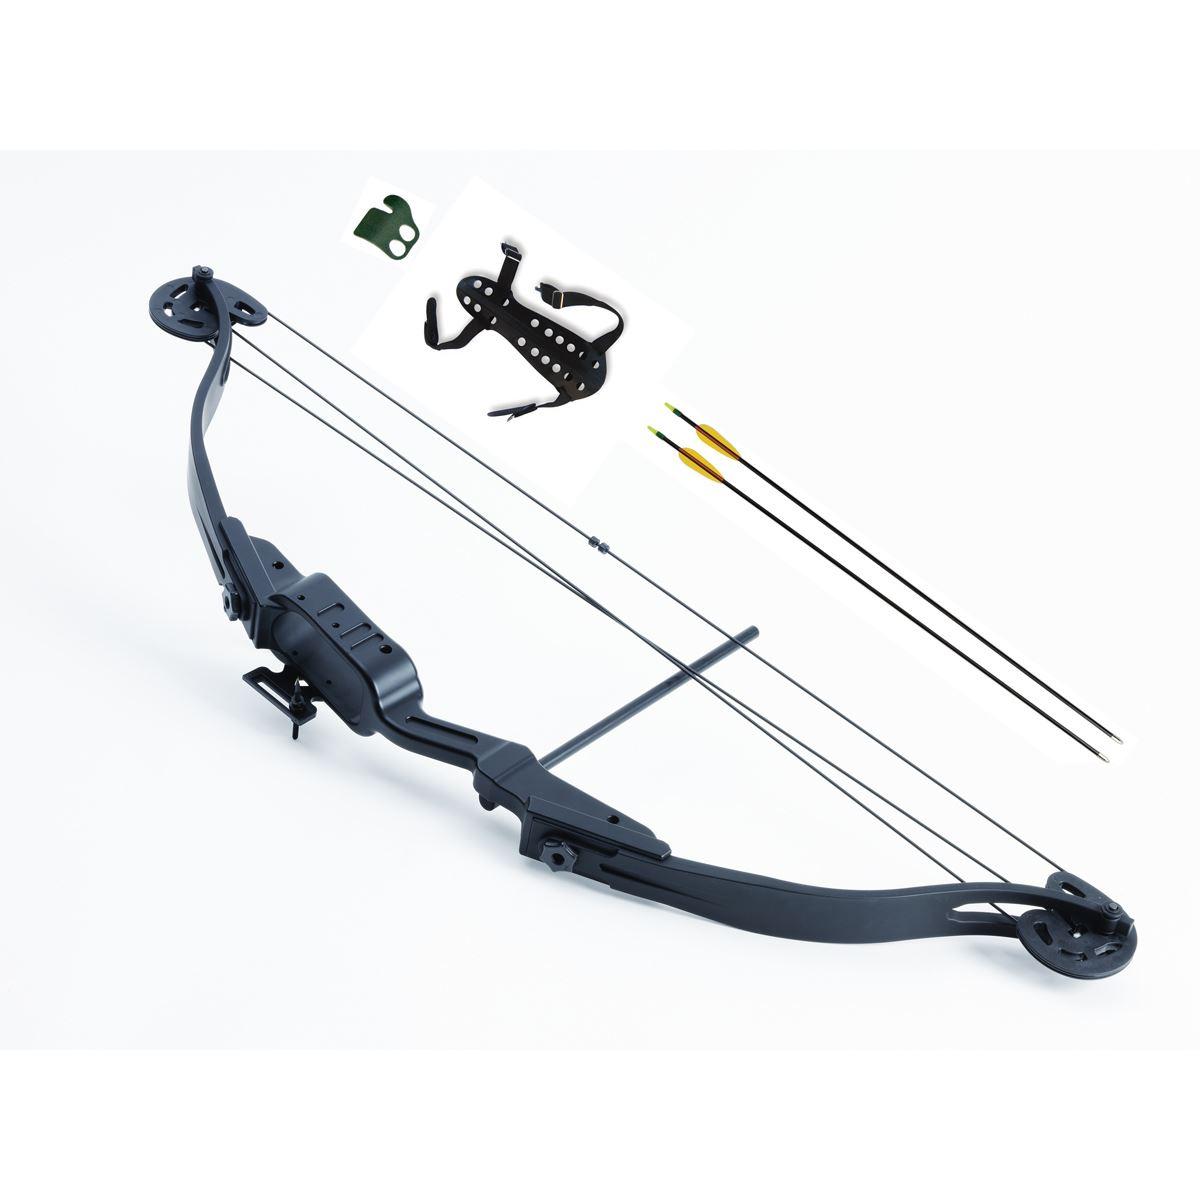 Petron Stealth Light Adult Compound Bow Archery Set Ebay